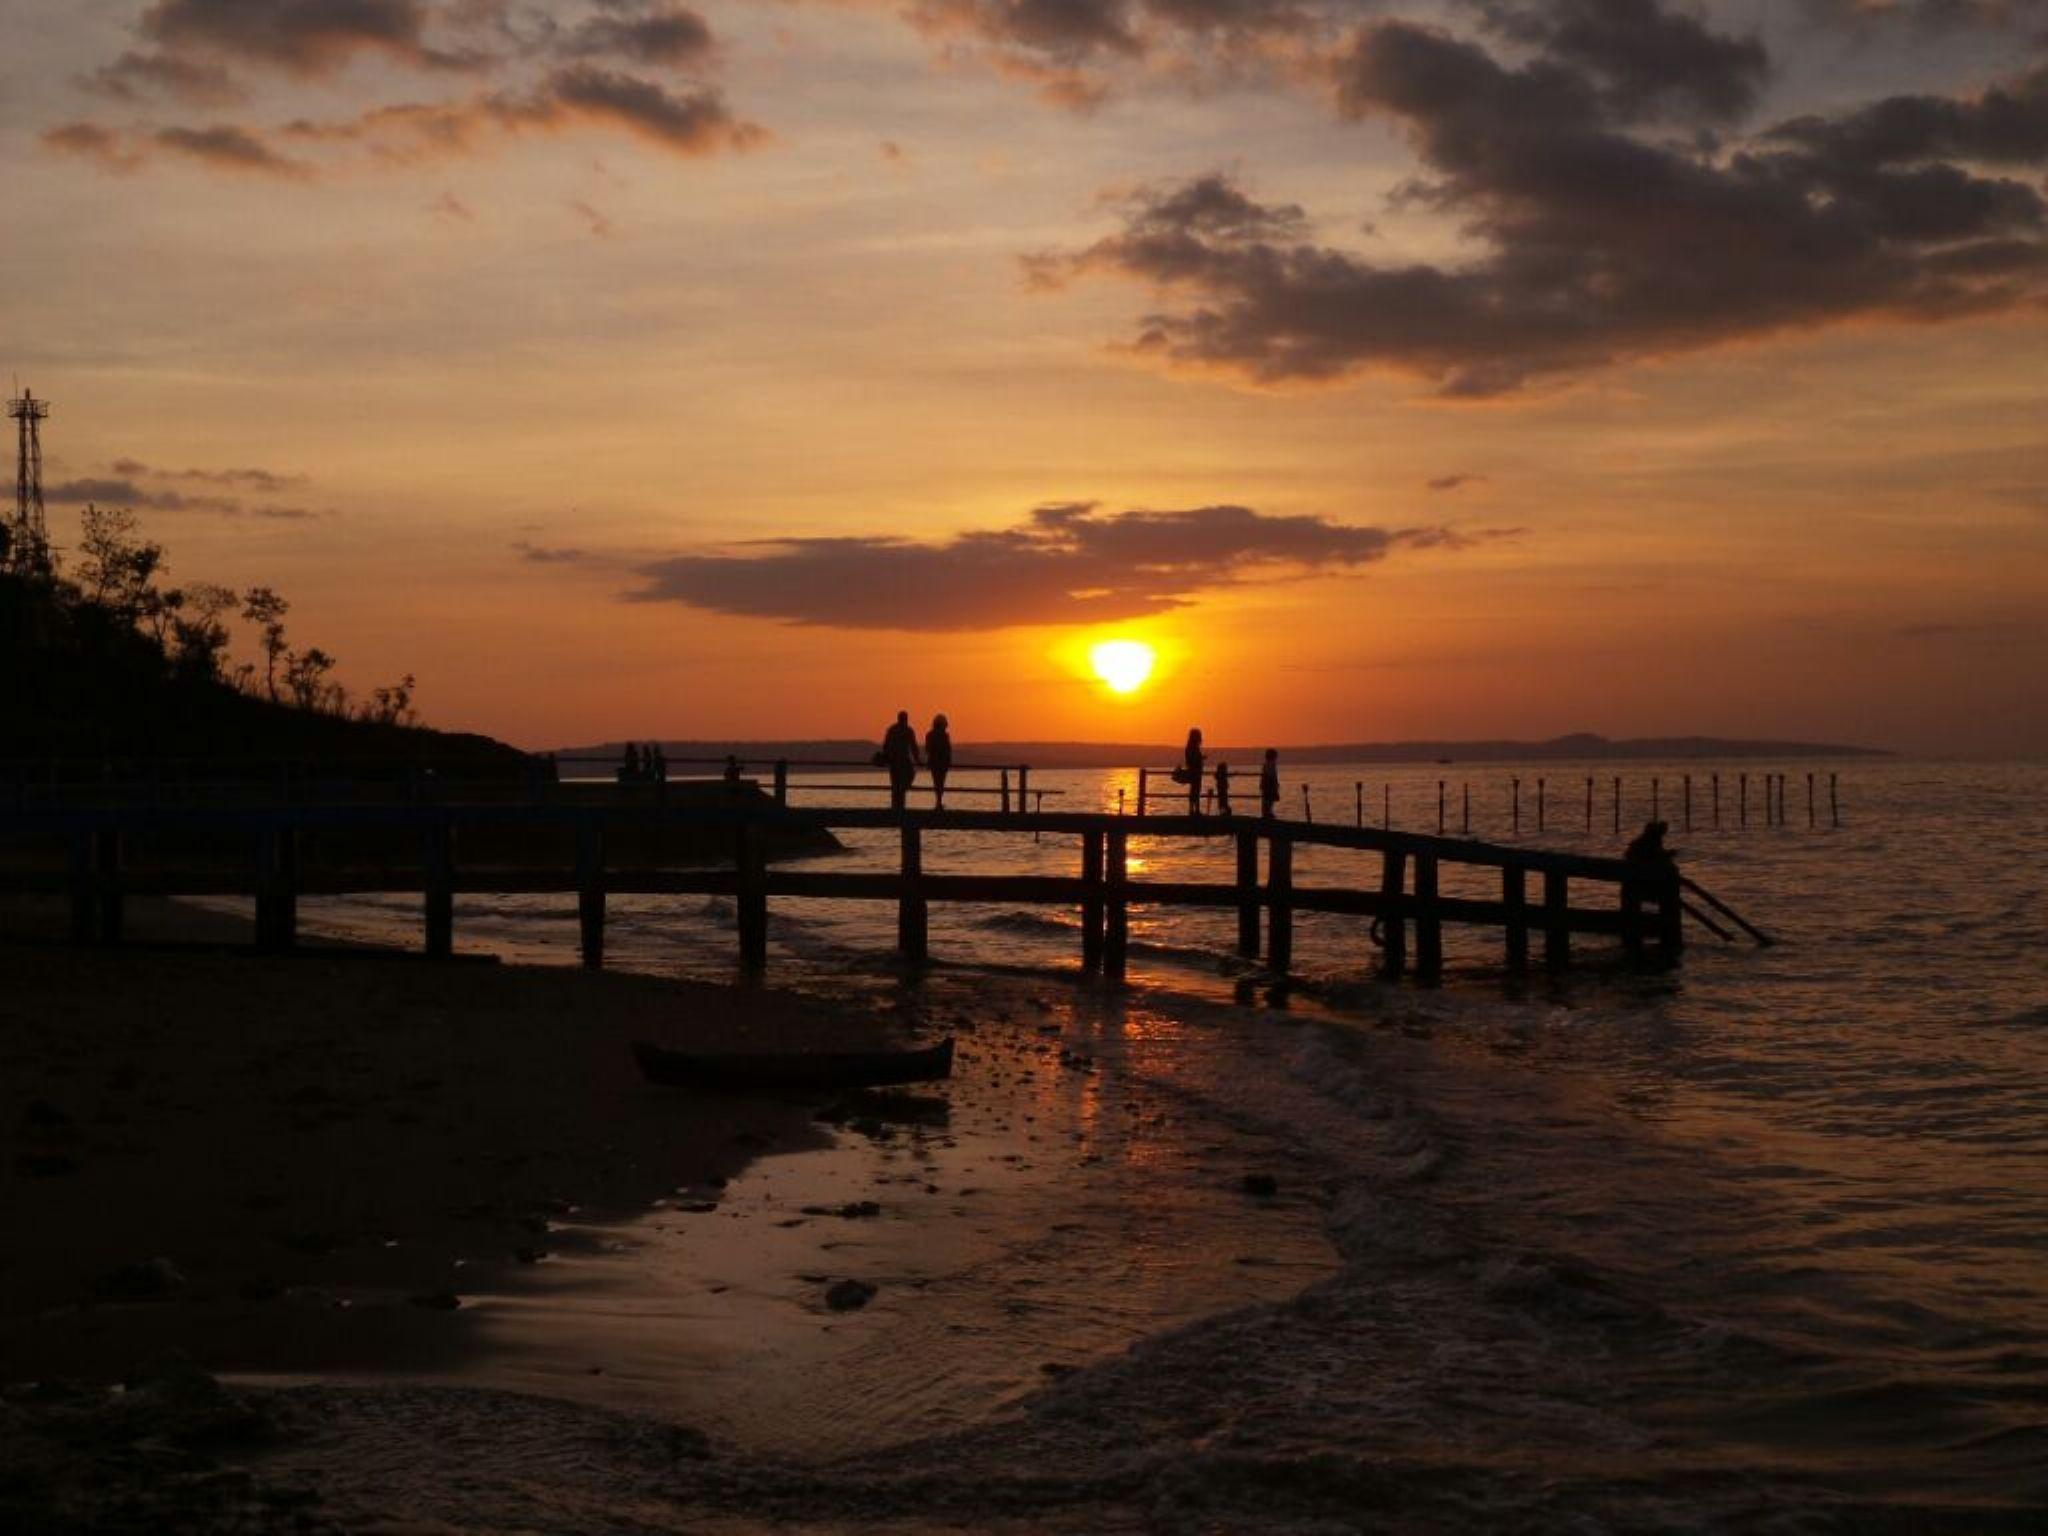 waiting sunset on the beach by riyan lanoe